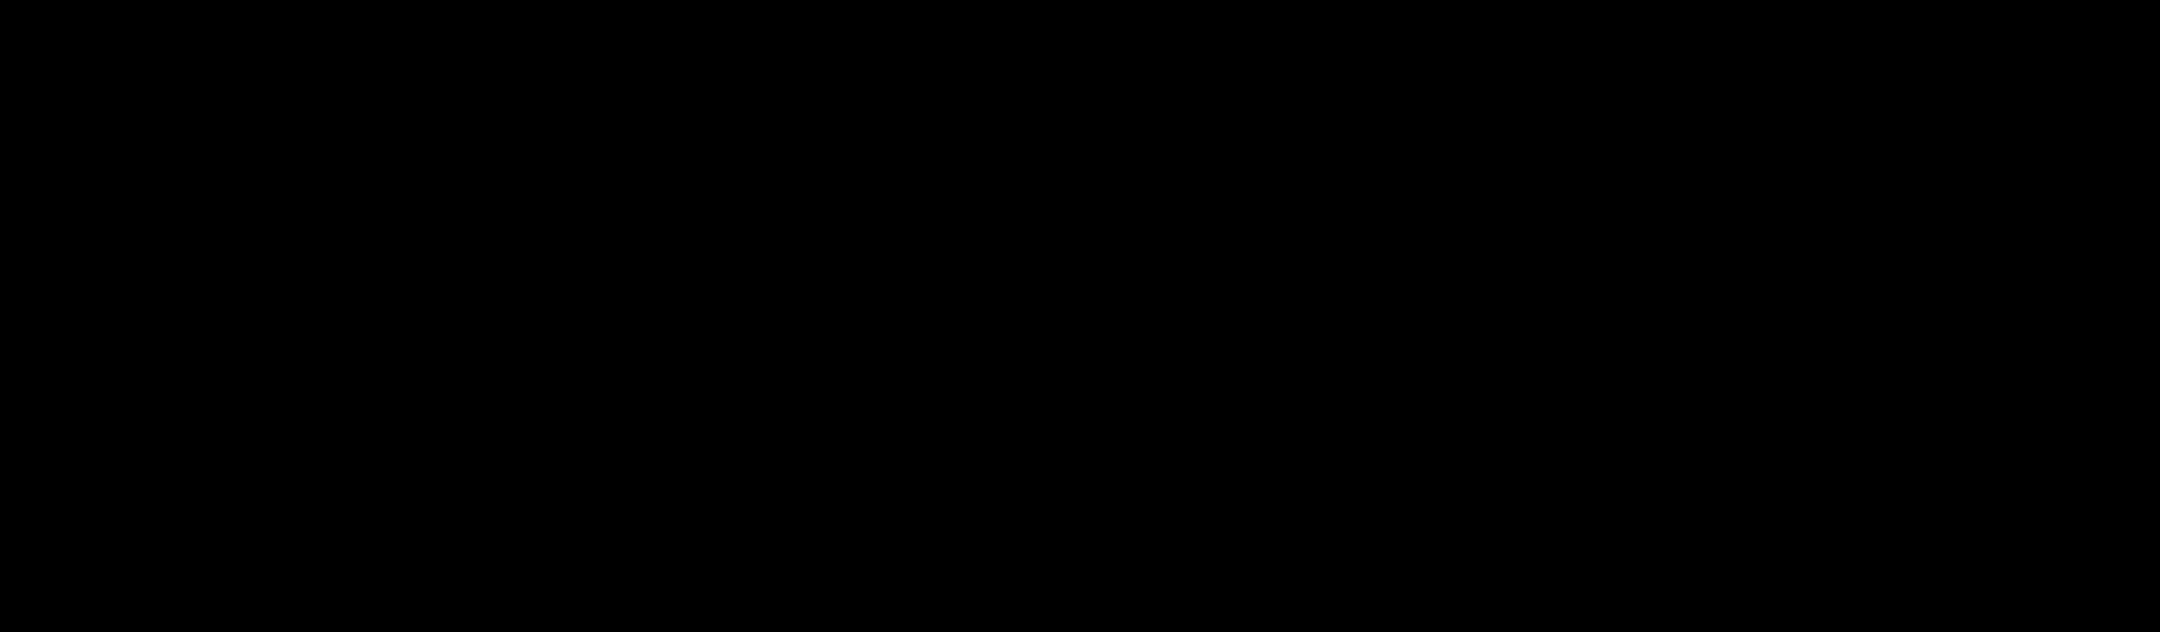 Blossom Rock Logo over White